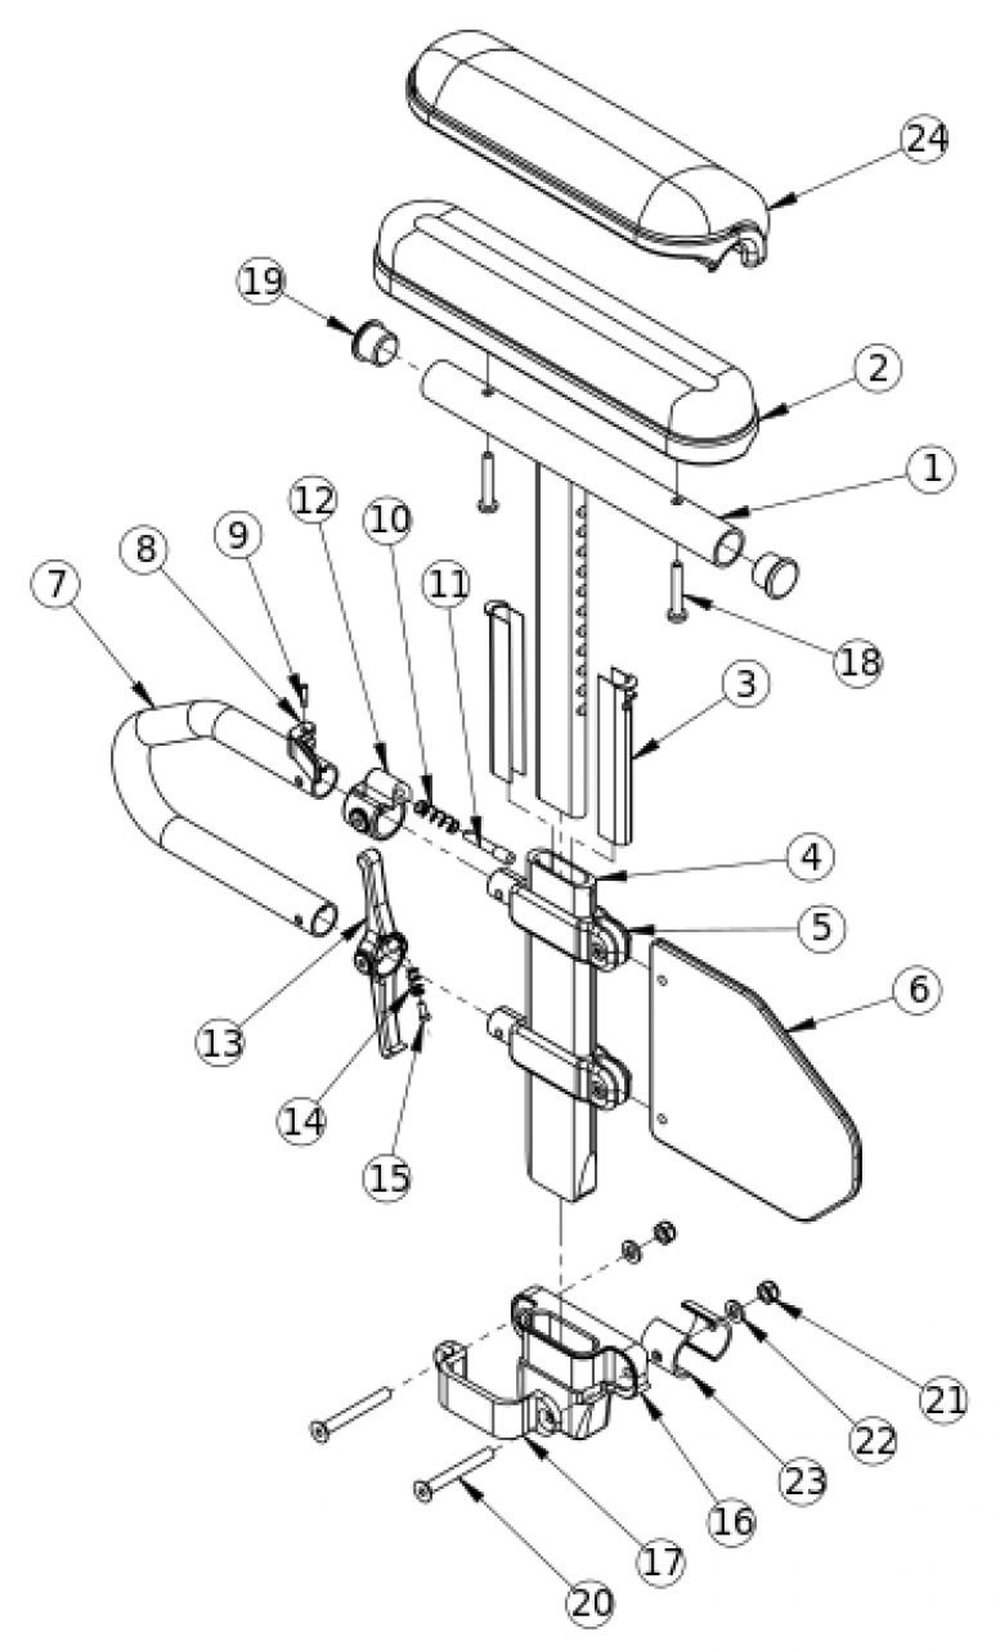 Discontinued Focus Cr Height Adjustable T-arm parts diagram